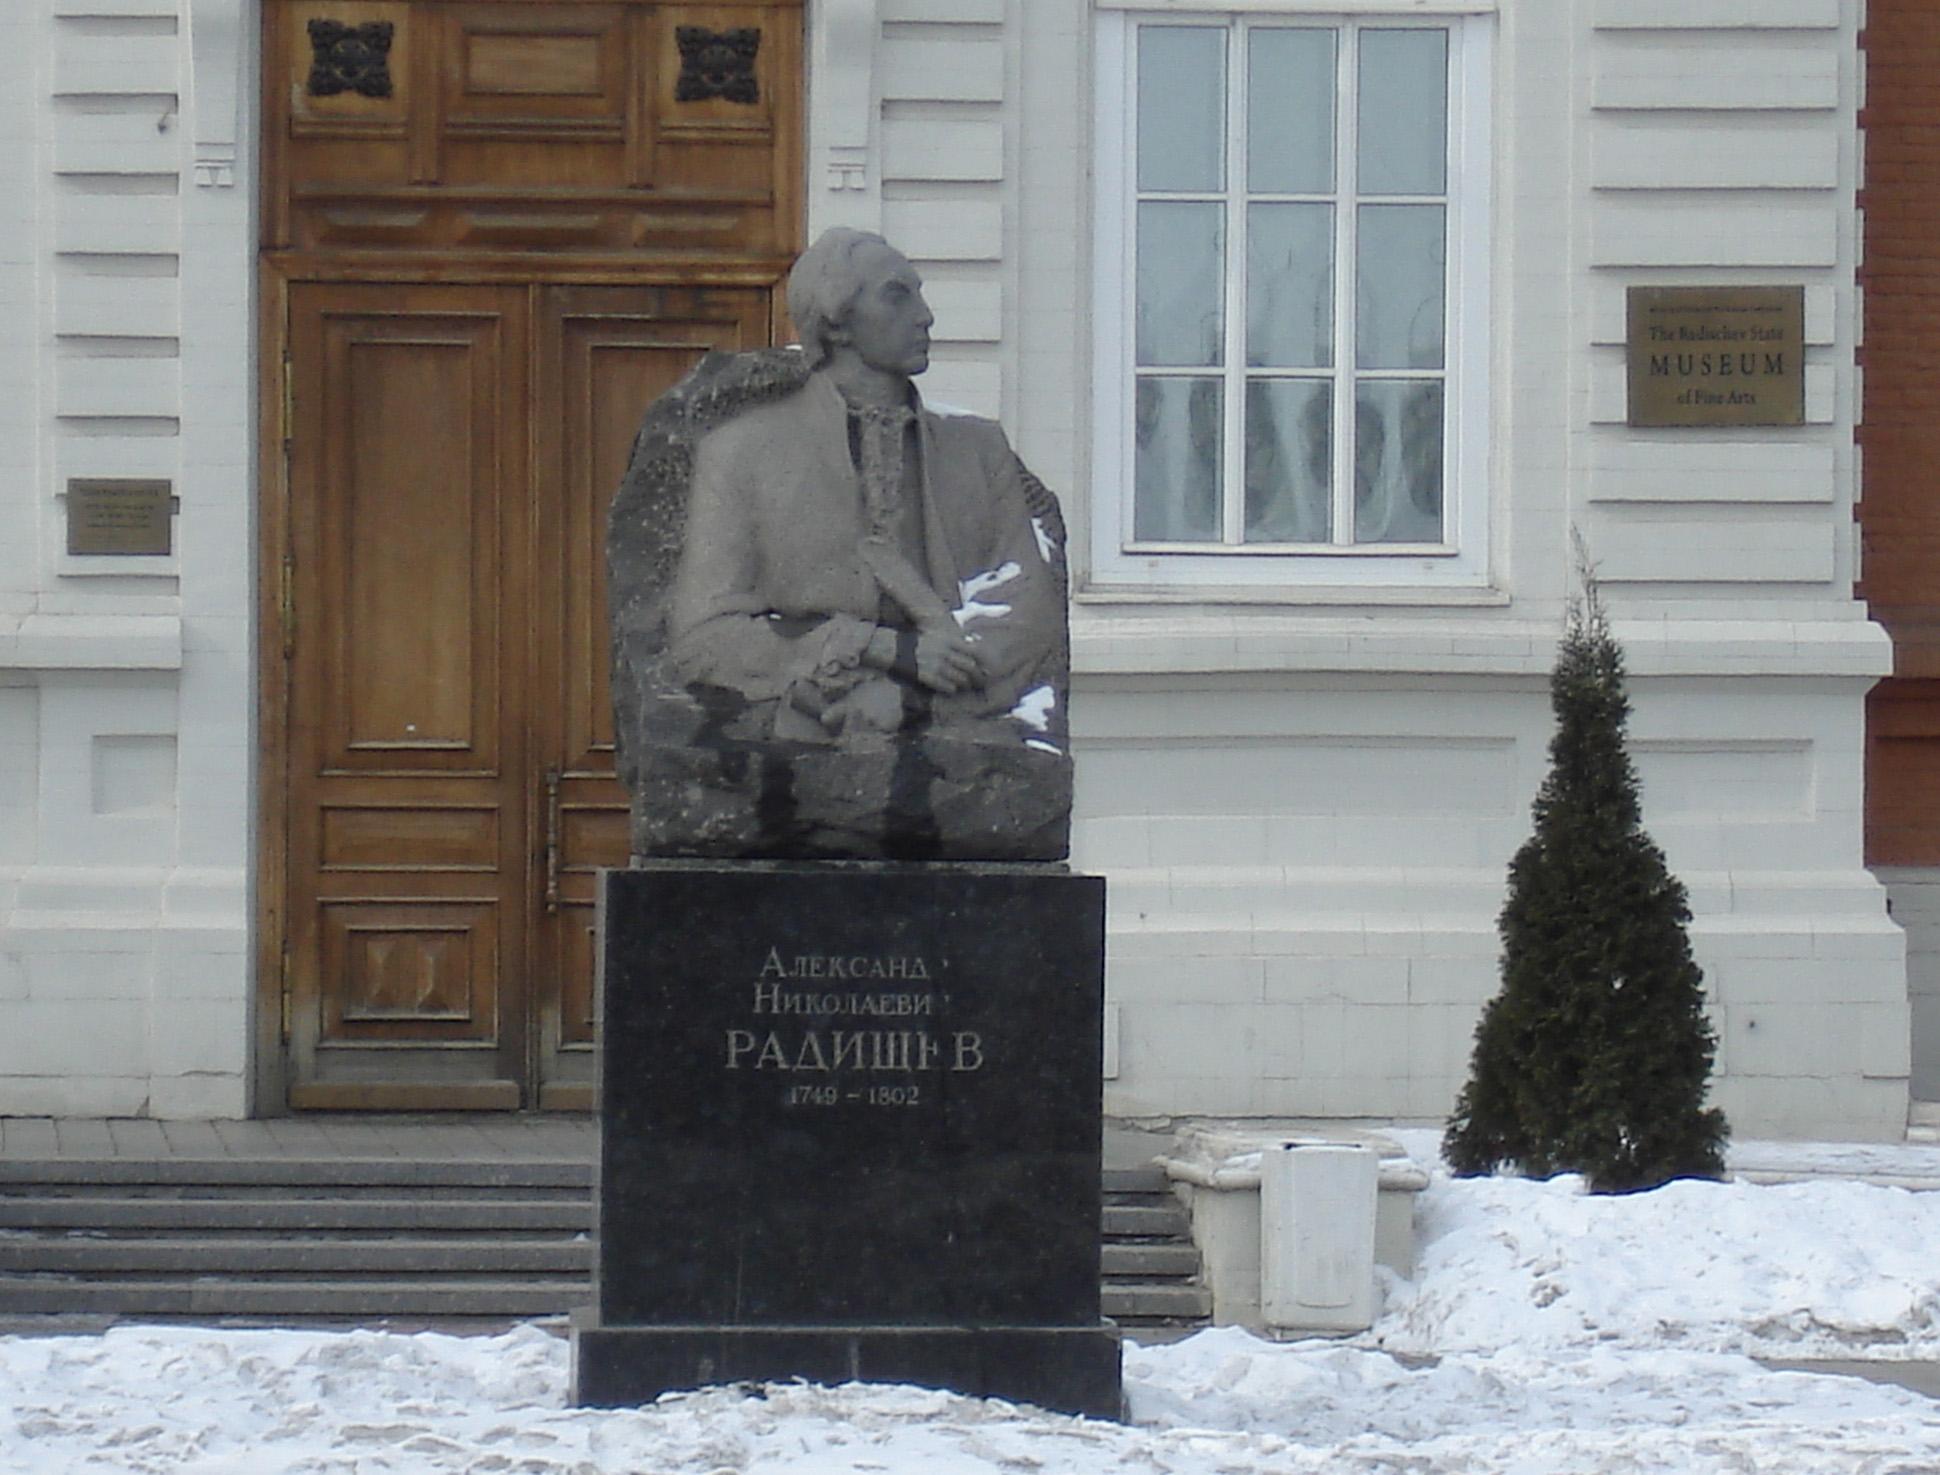 Памятники саратов цена евросеть цены на памятники пермь омске